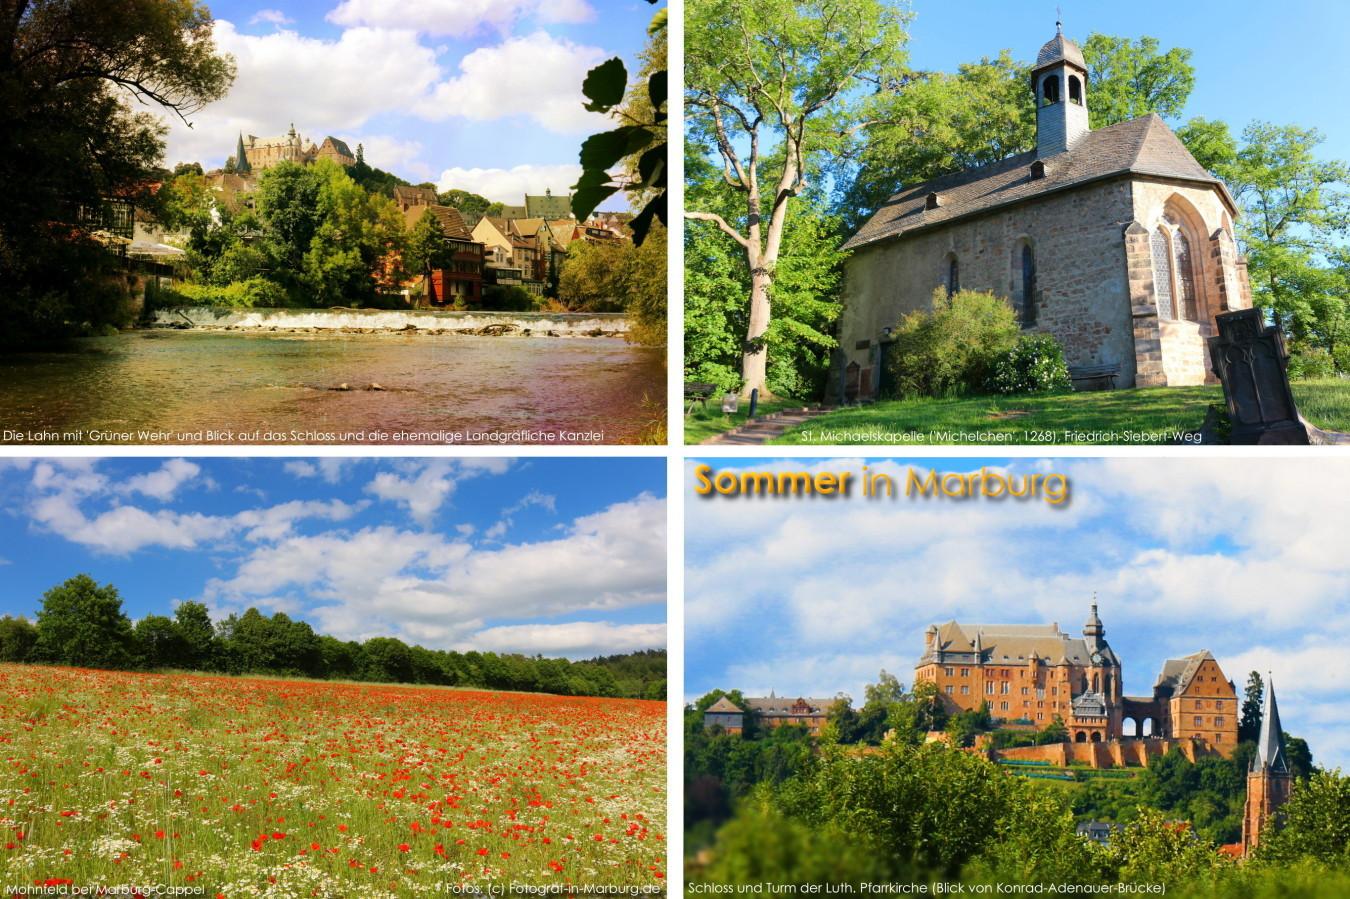 Kalender Marburg 2021 _ 07 - Juli.JPG